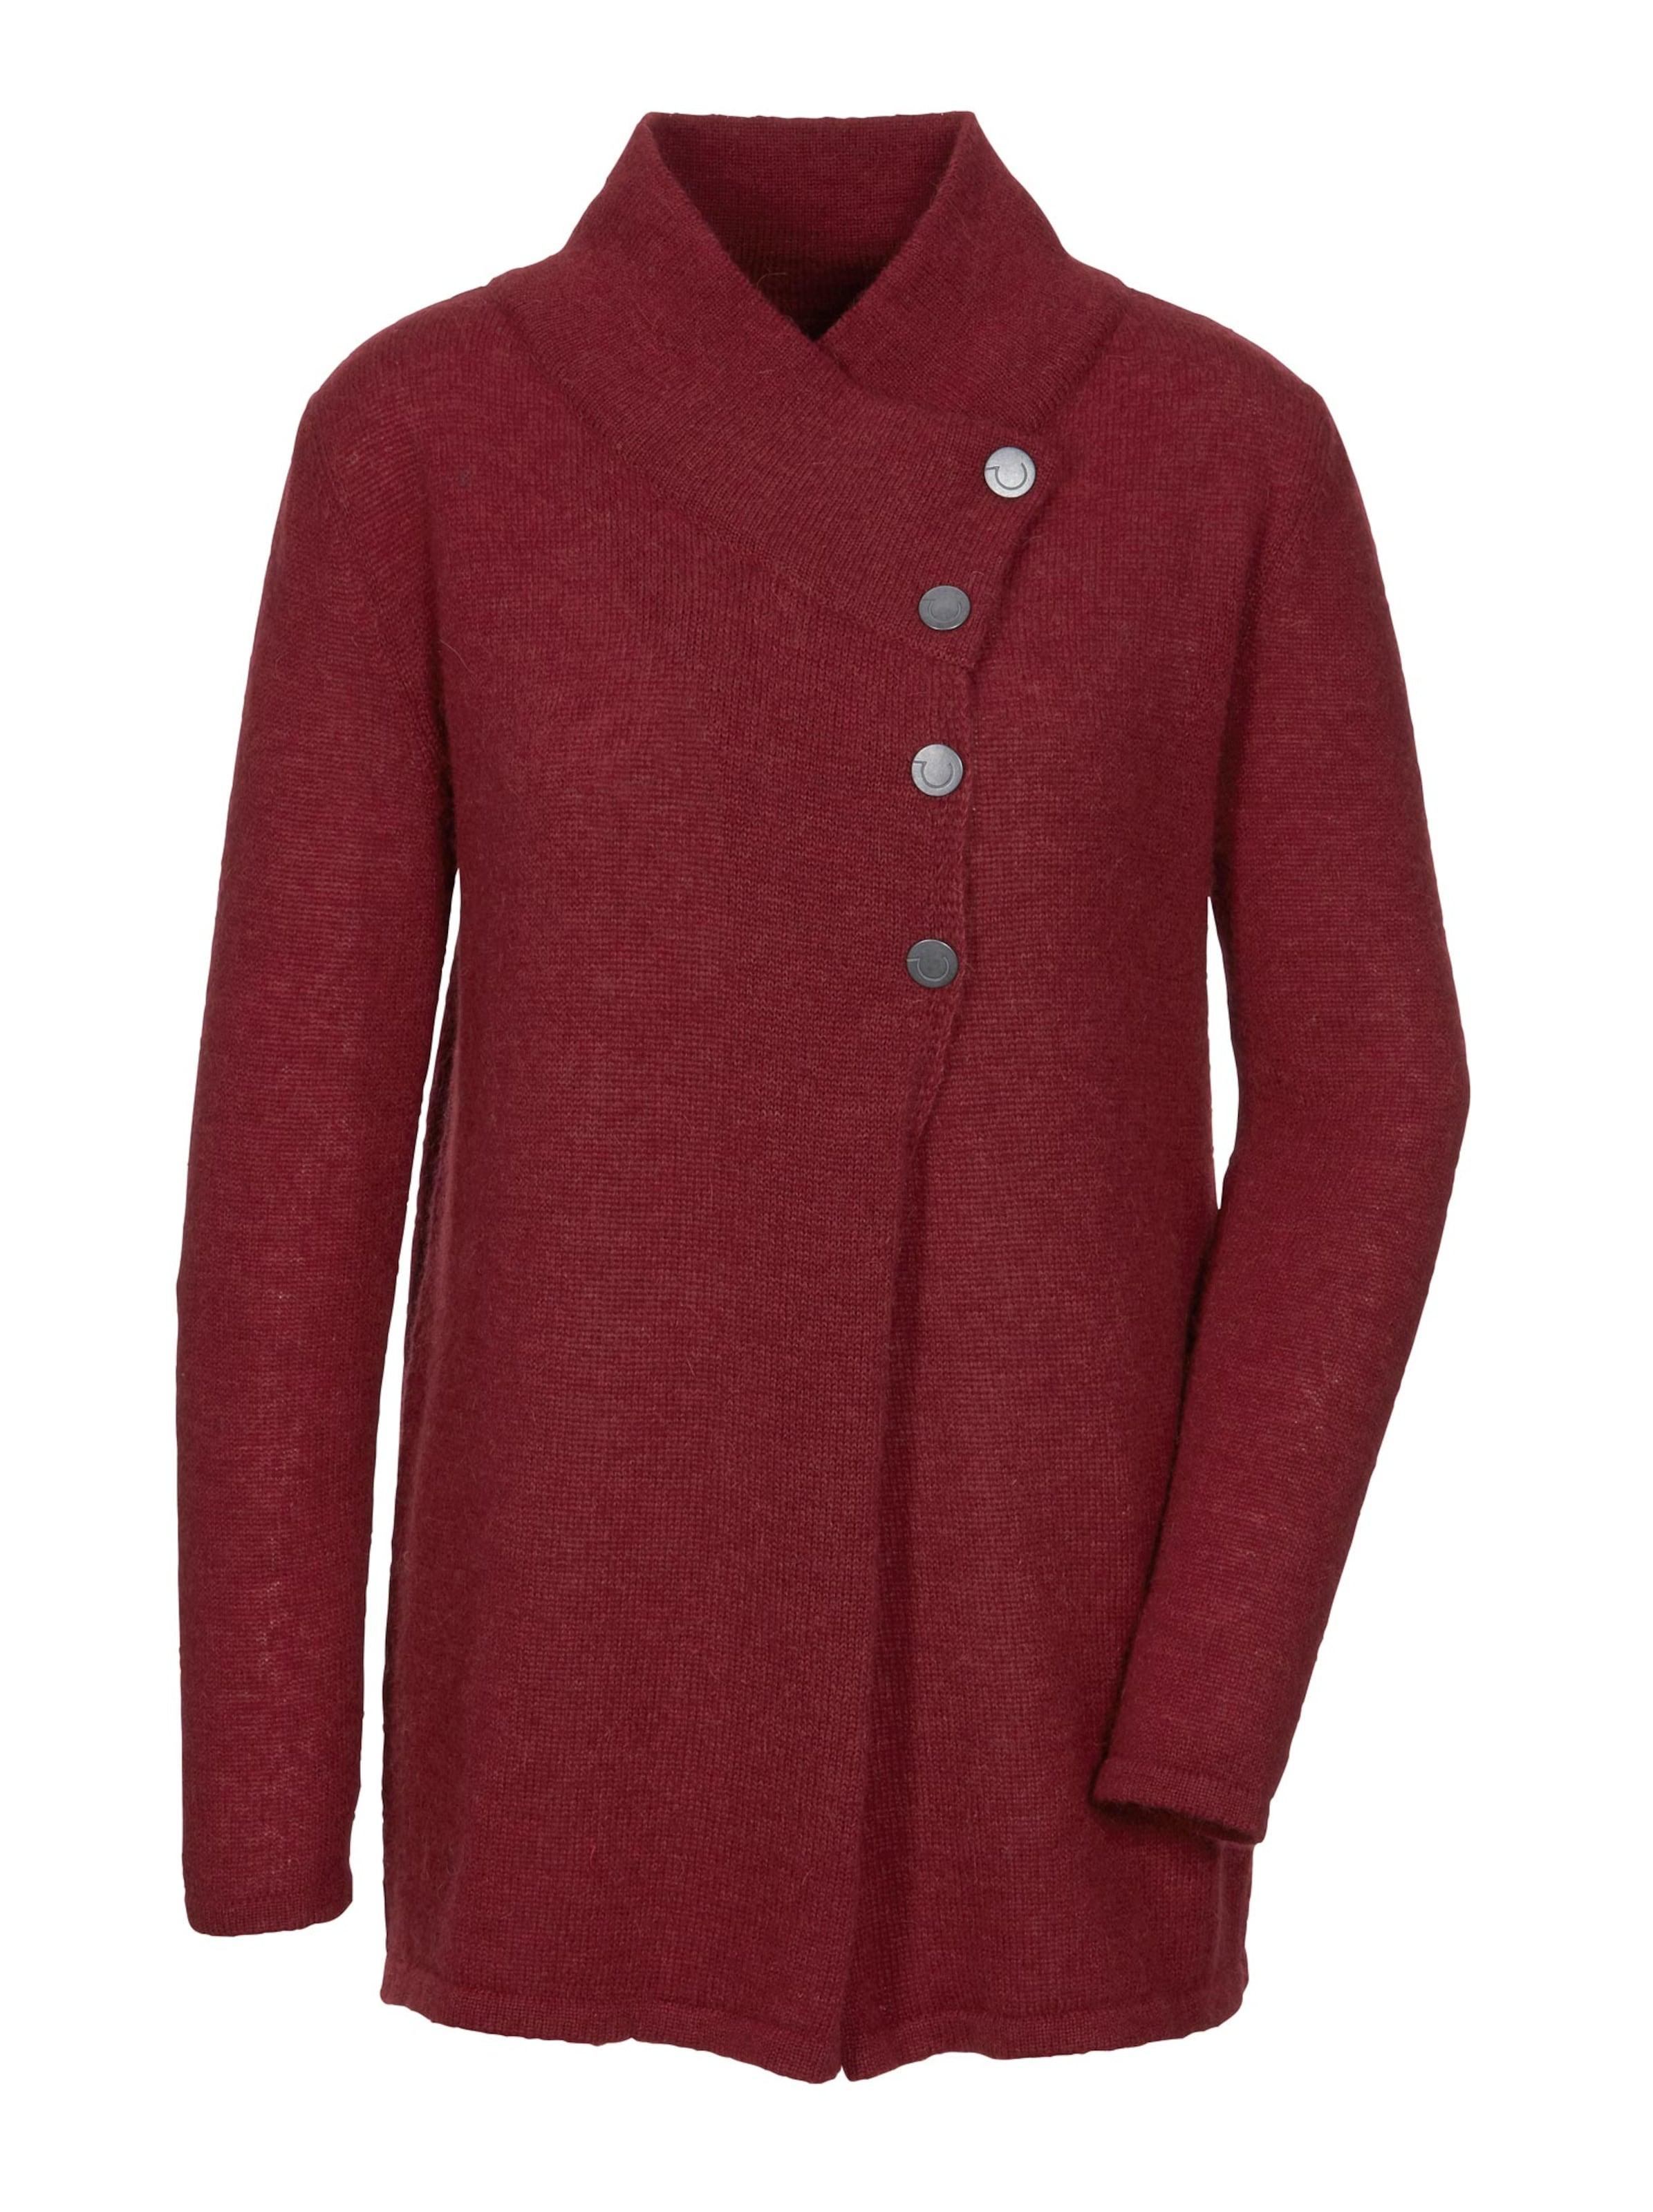 creation l premium - Witt Weiden Damen Woll-Alpaka-Pullover kirsche